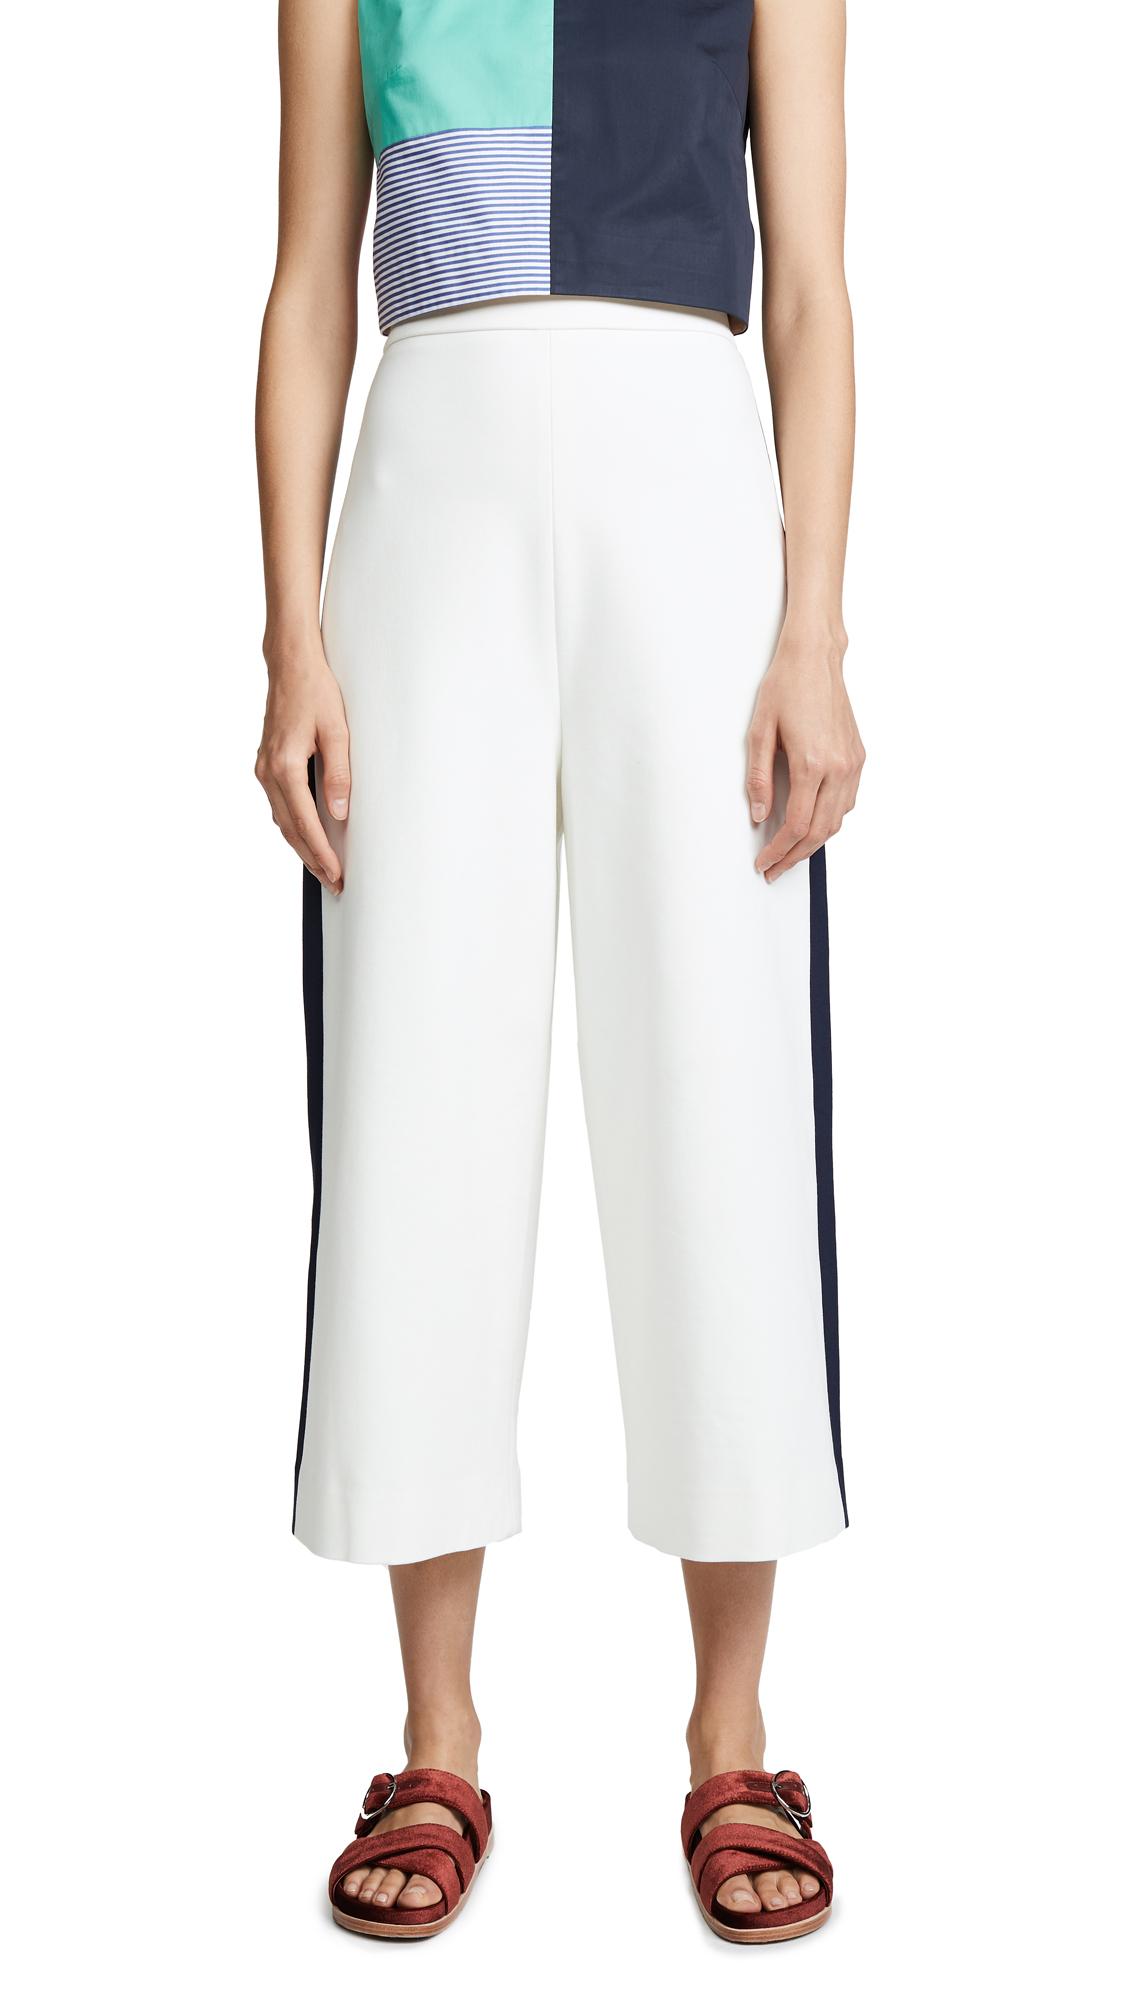 Tibi High Waisted Nerd Pants - Ivory